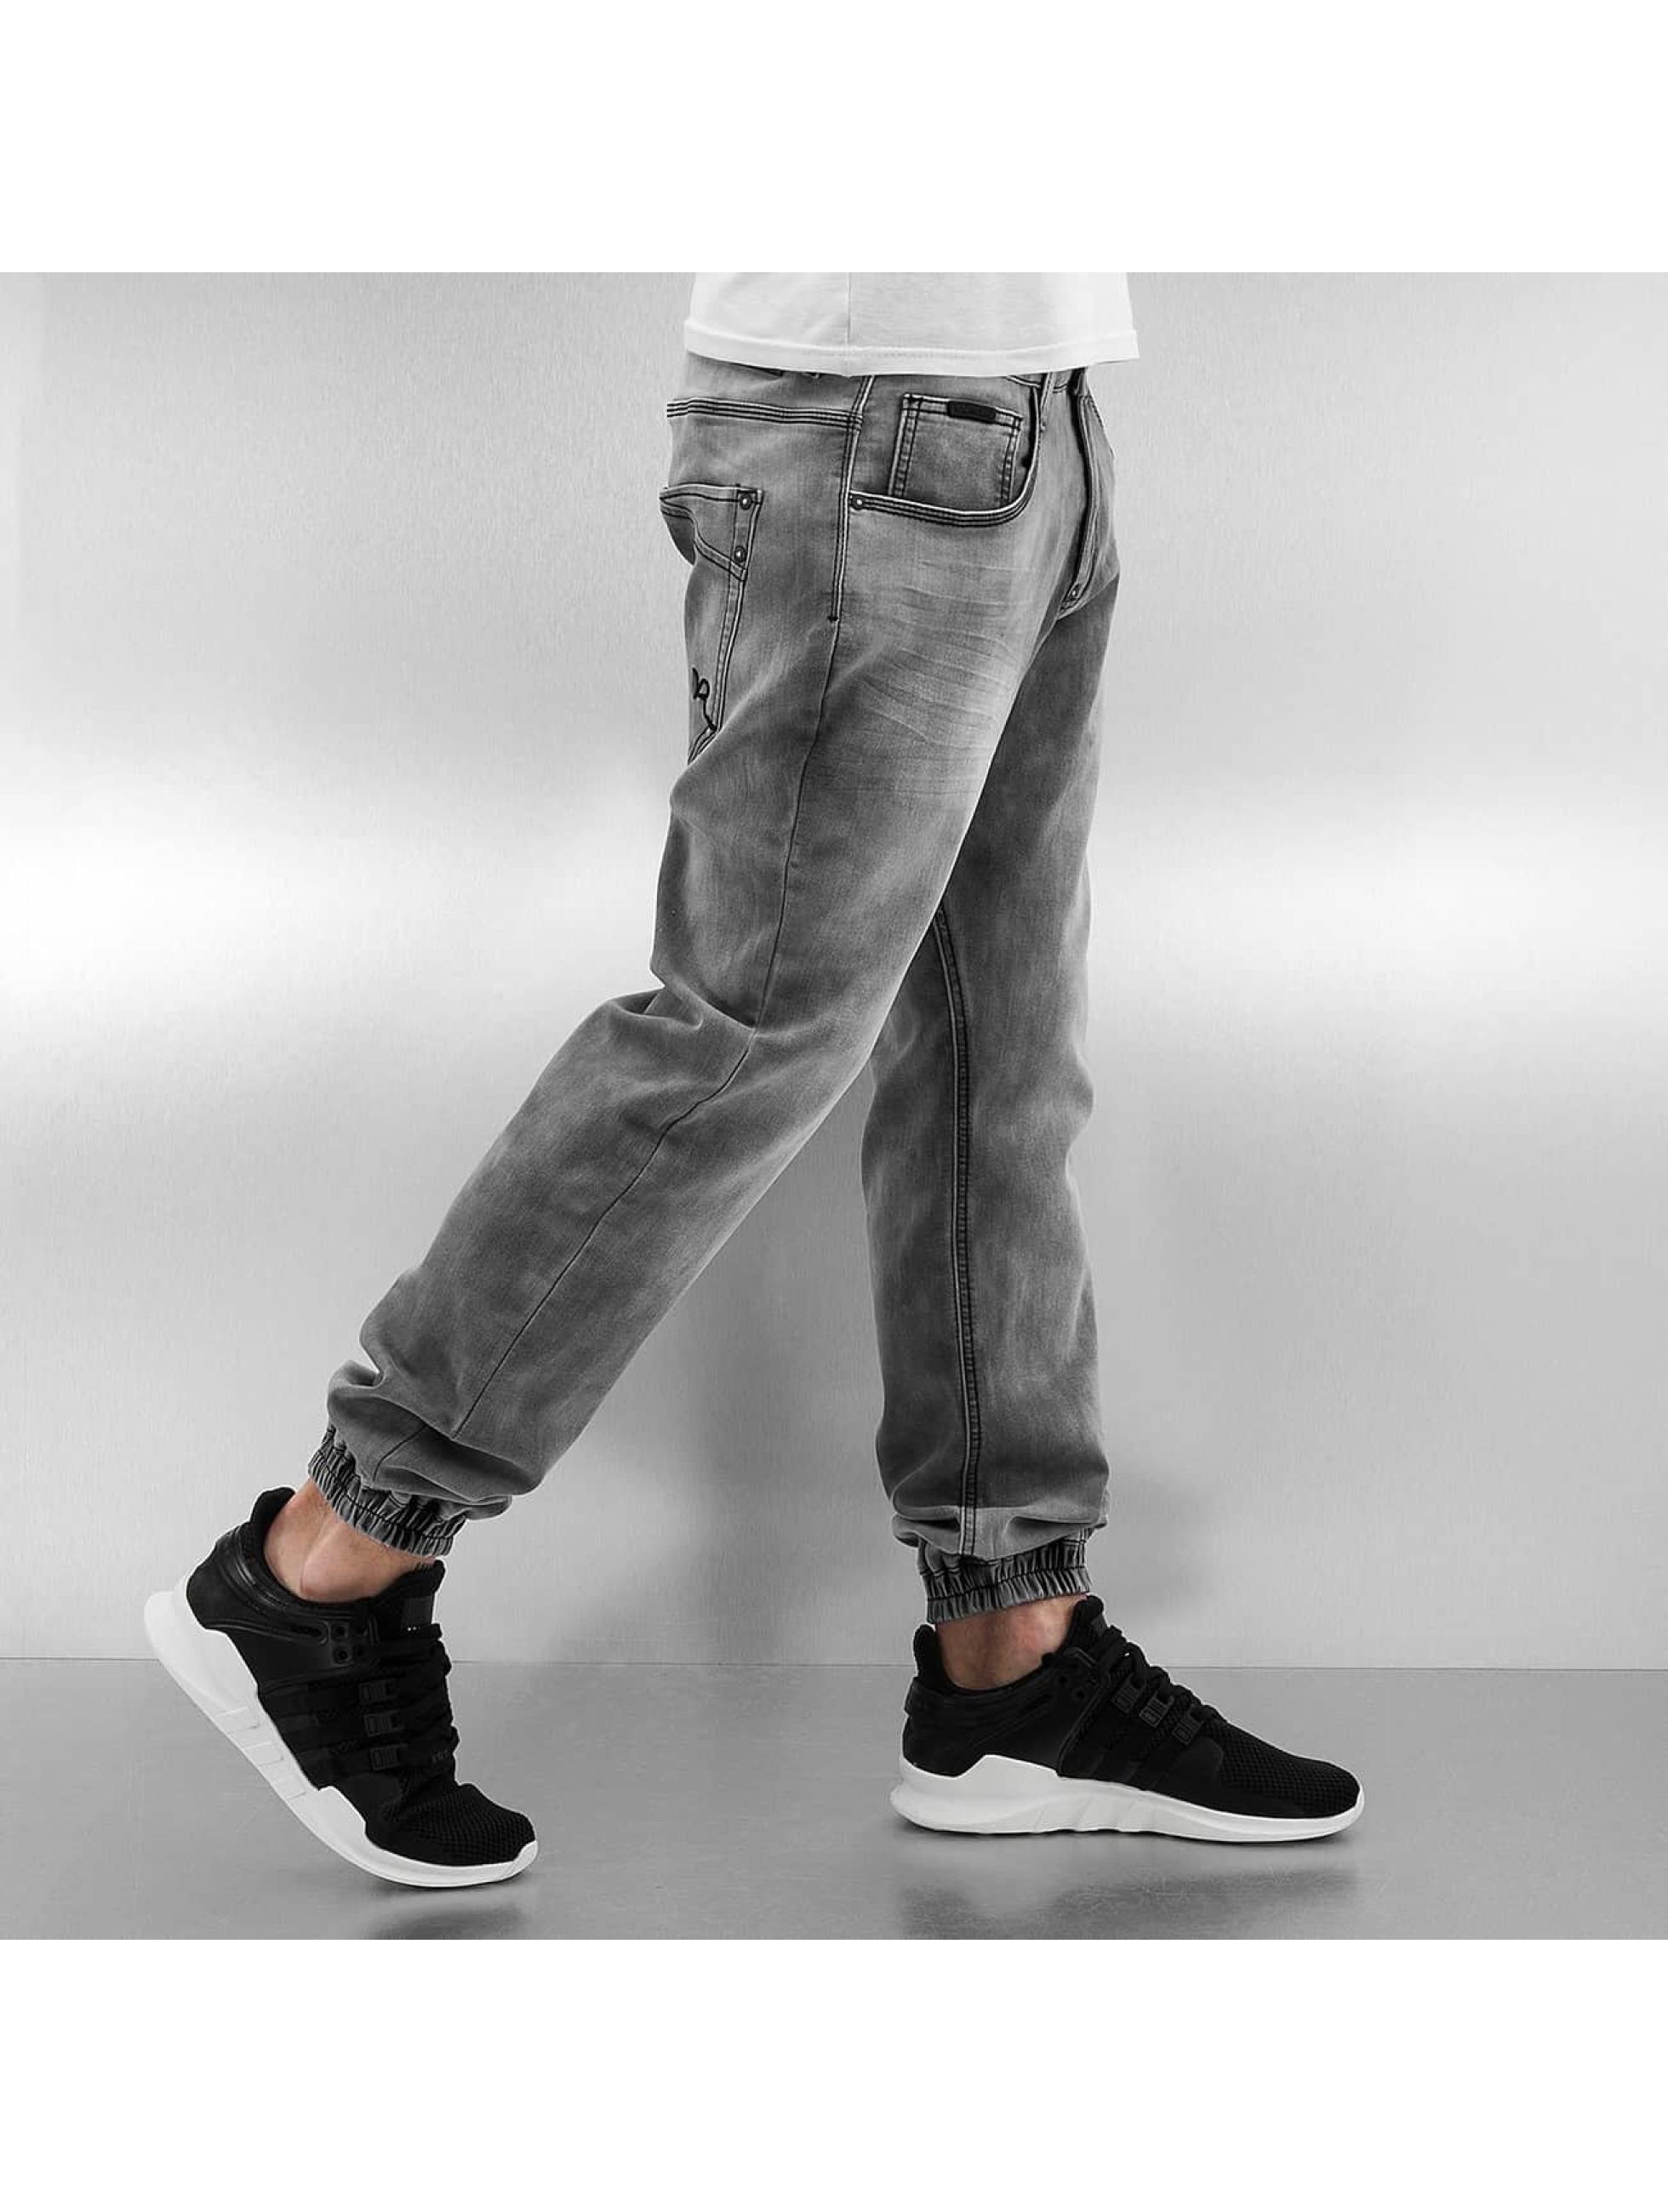 Rocawear Antifit Jogger grey